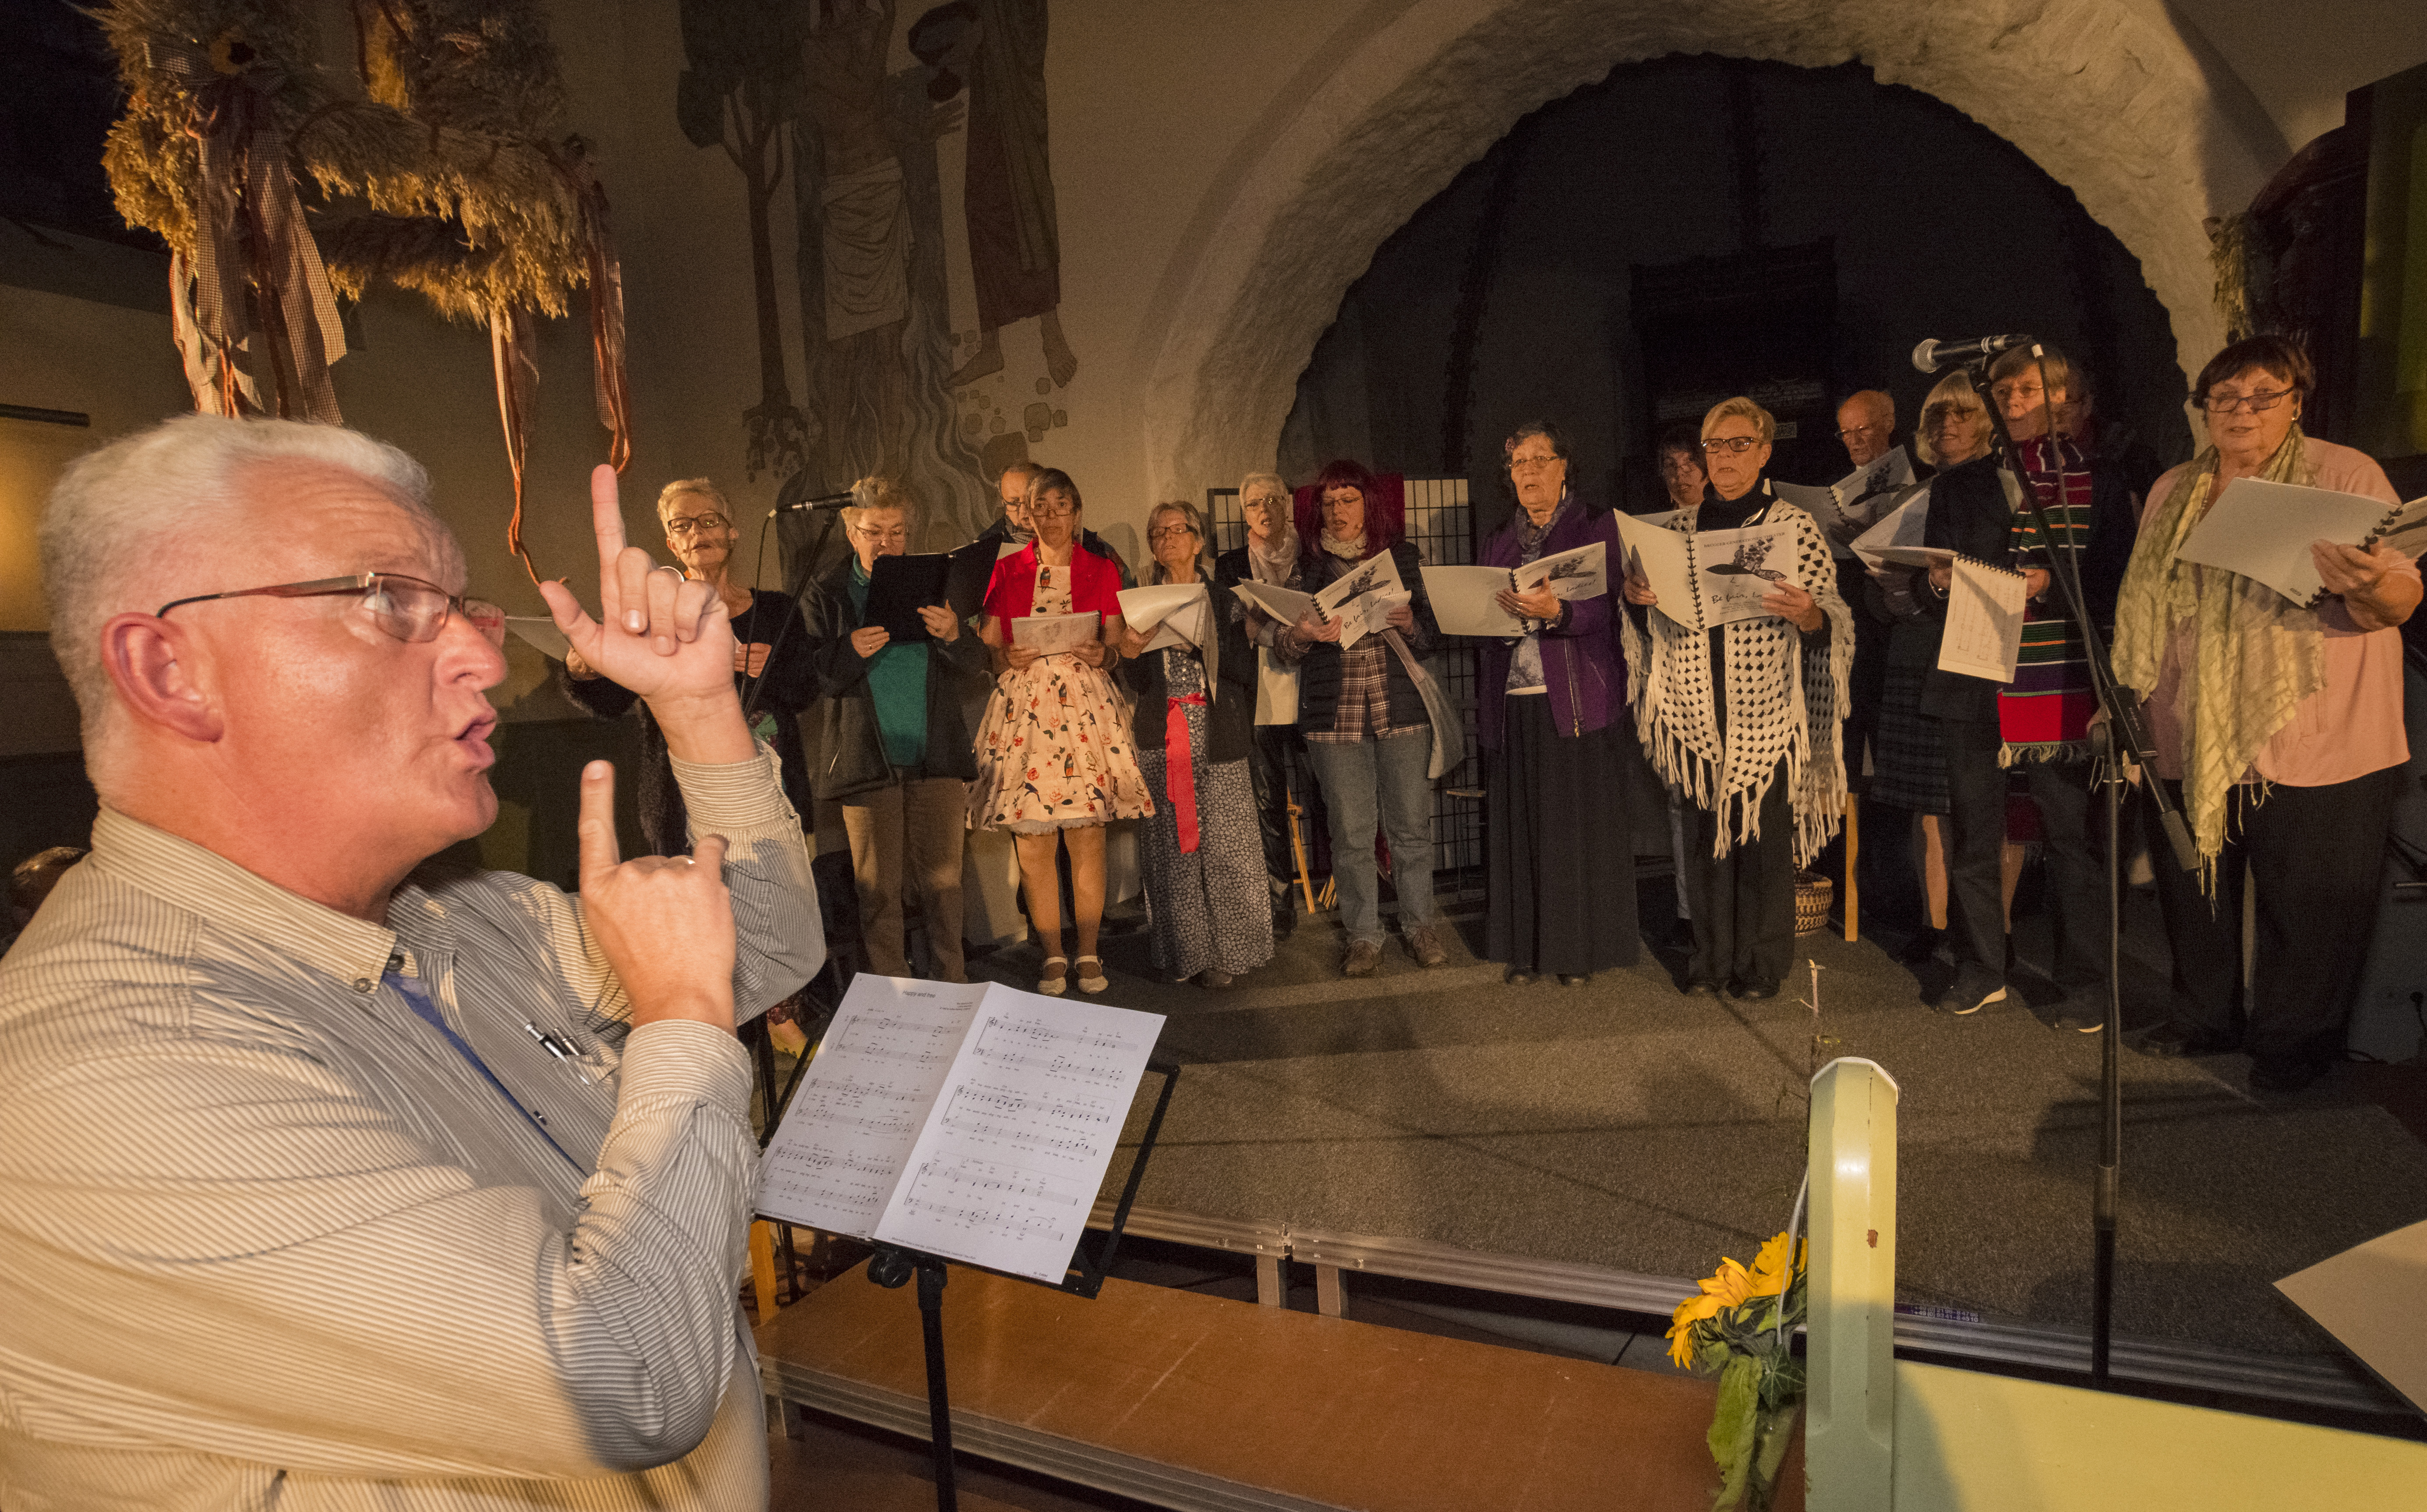 St. Johannis-Kirchengemeinde Brügge, Birgit Bockmann, Brügge,Be fair, Lady